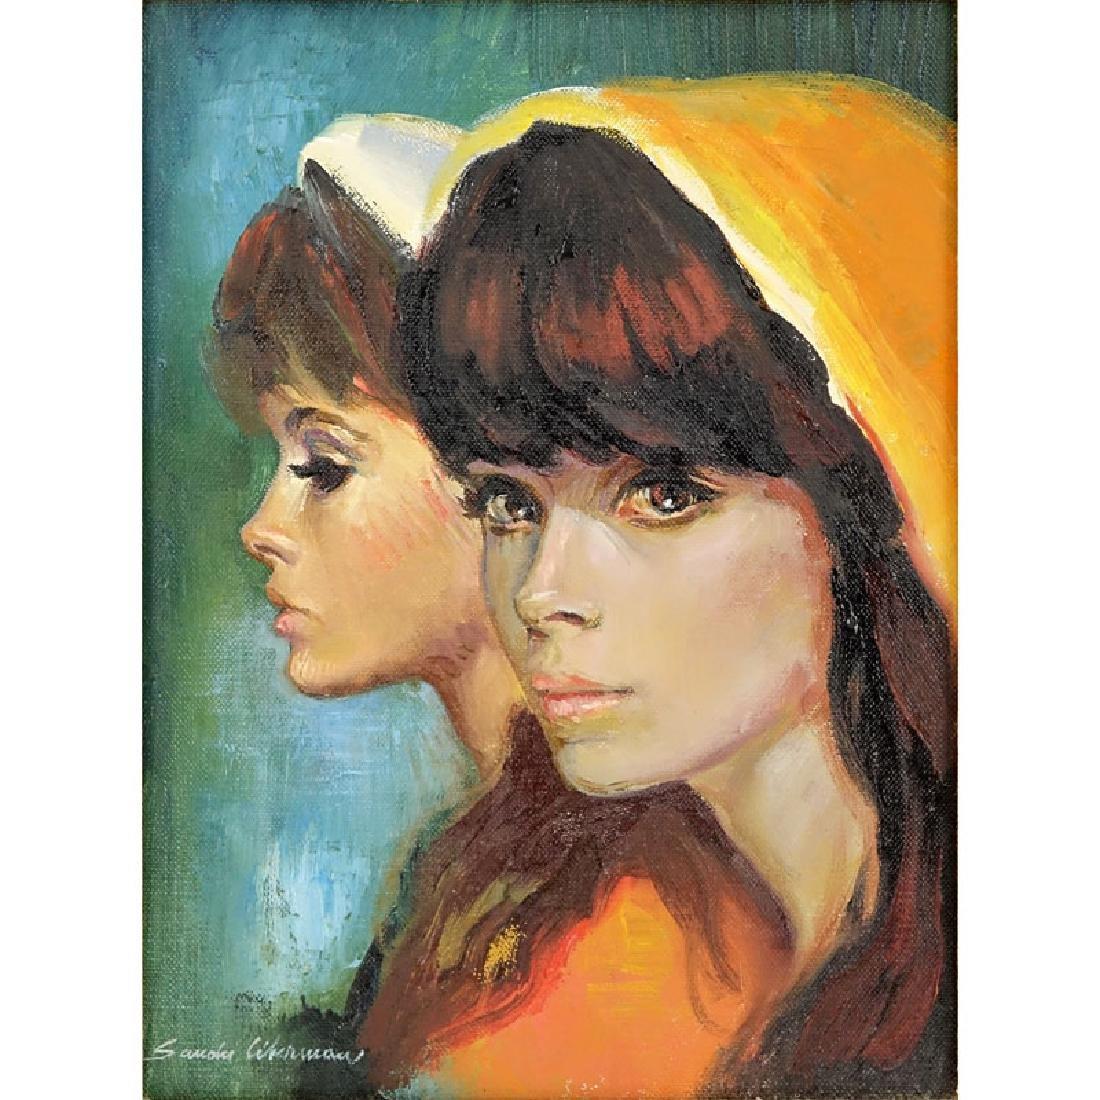 Sandu Liberman, Romanian (1923 - 1977) Oil on Canvas